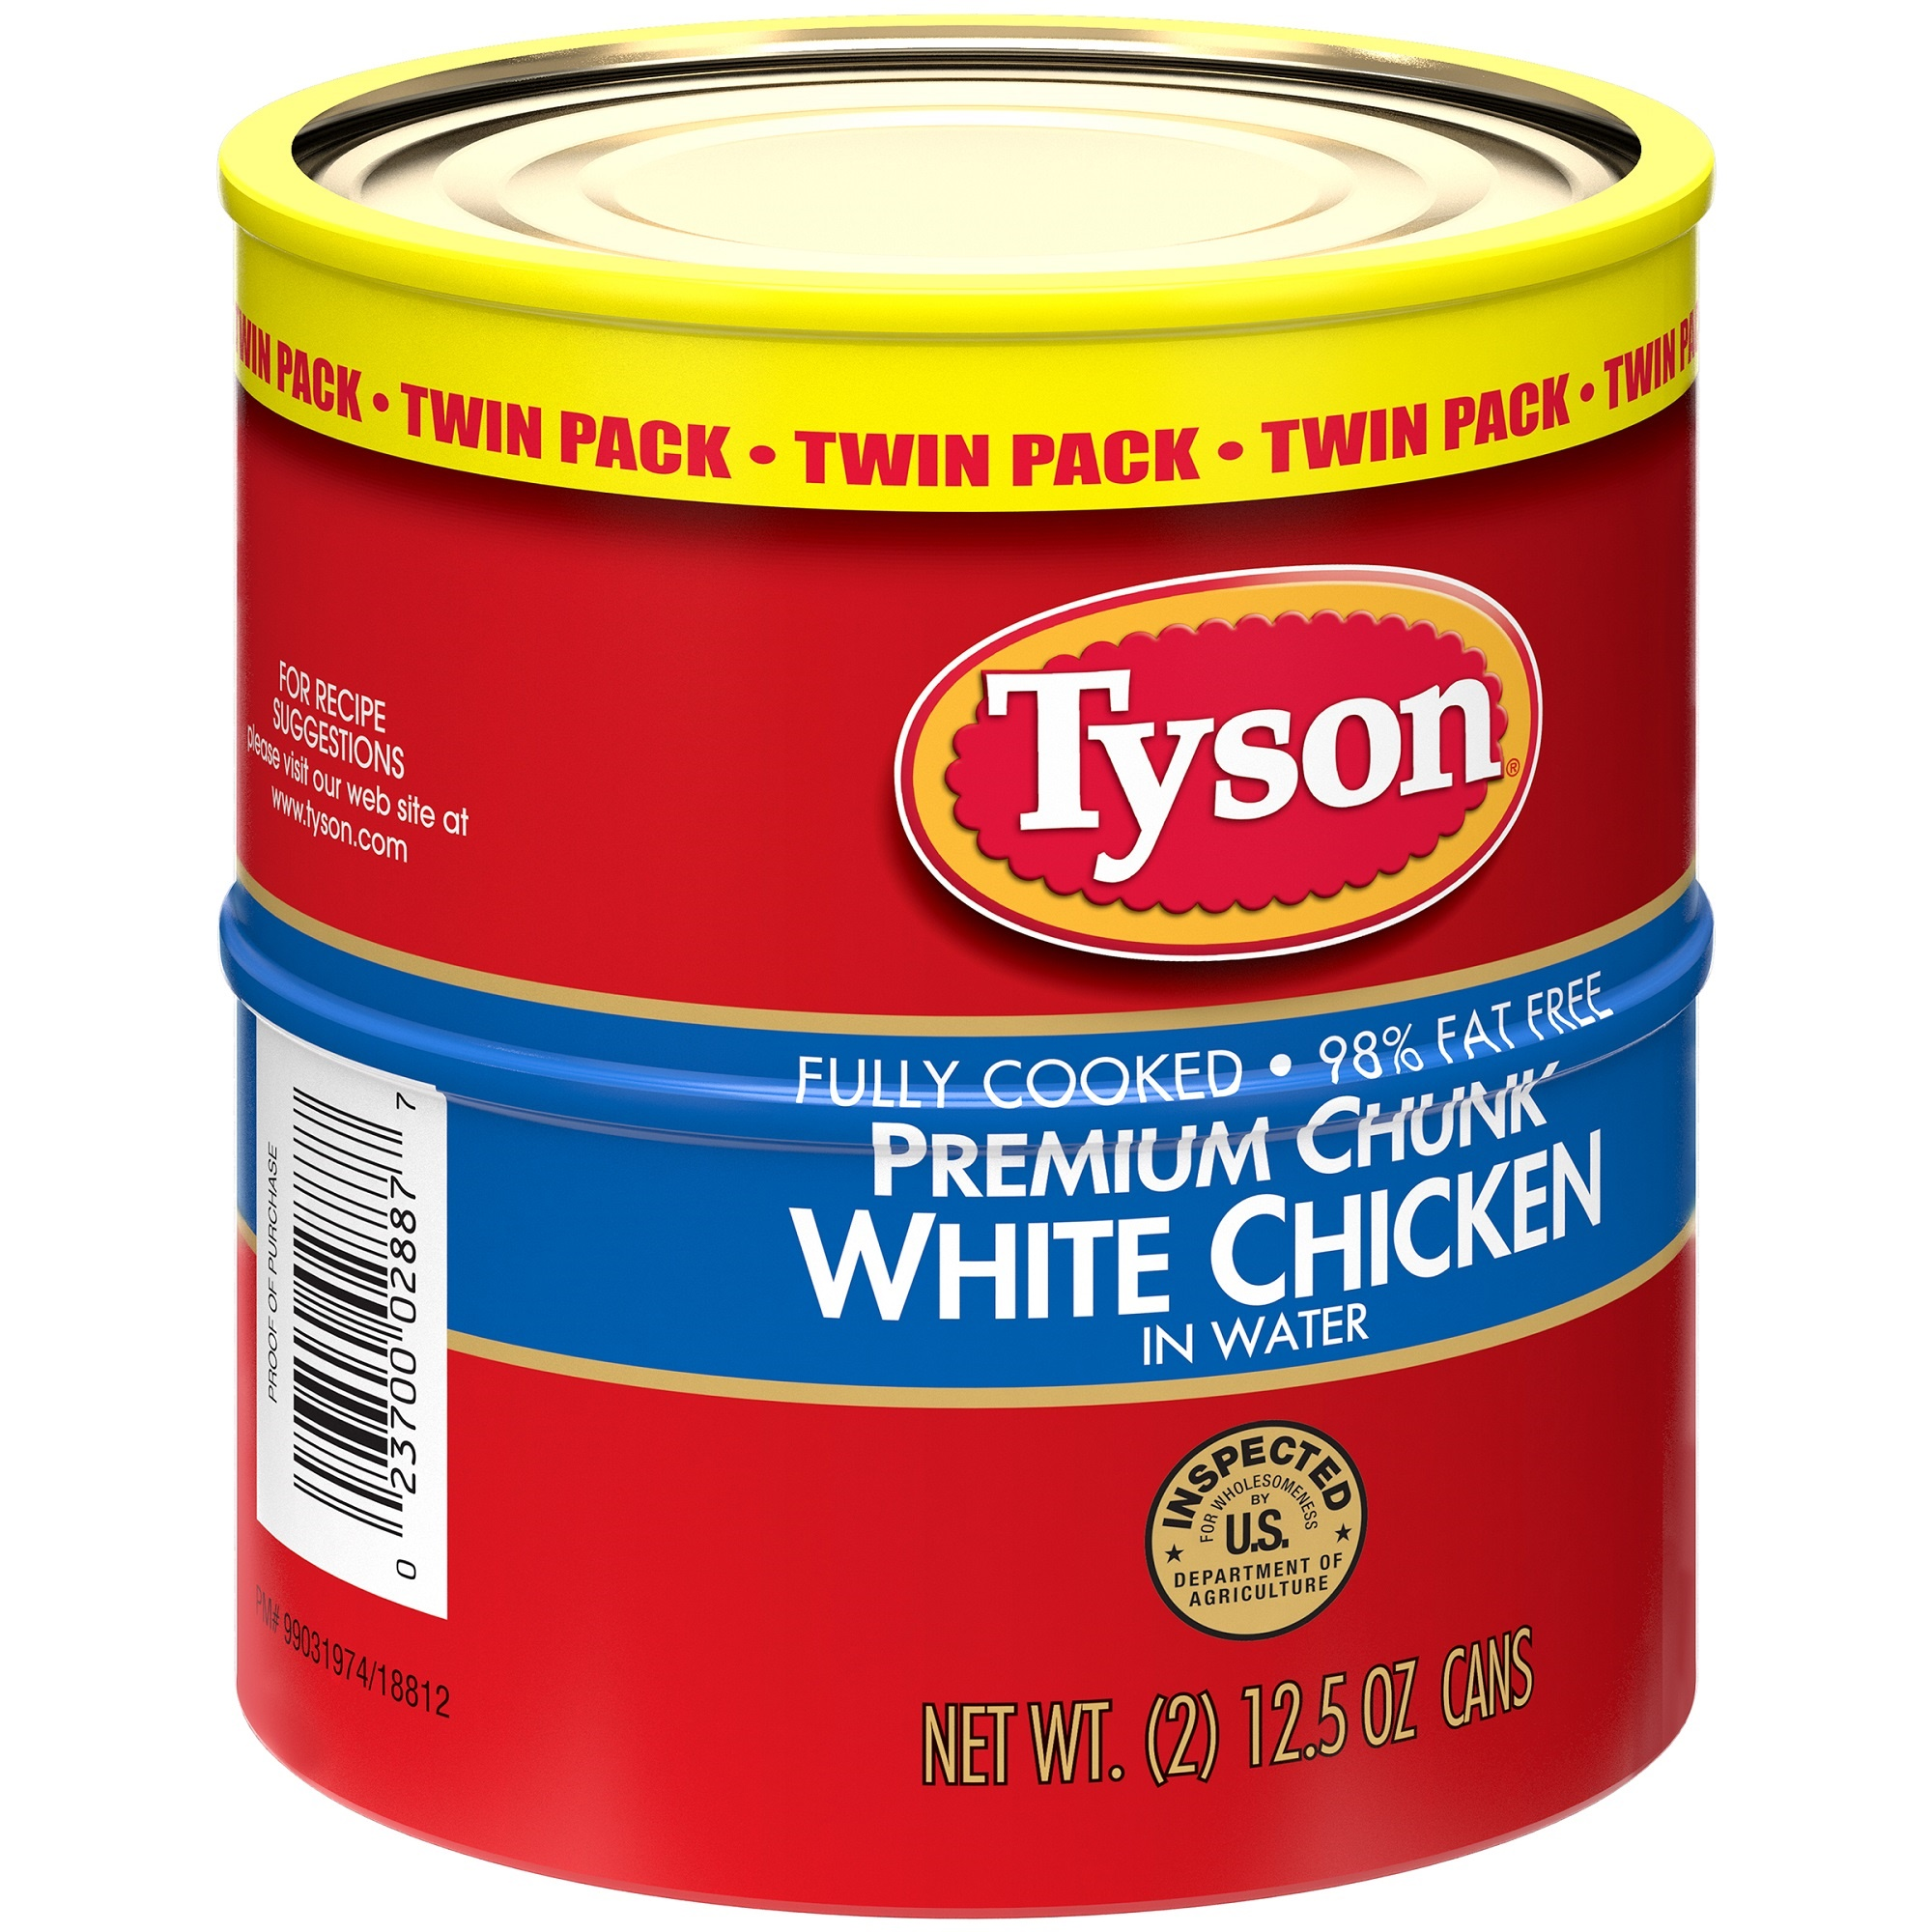 Tyson Premium Chunk White Chicken Twin Pack, 12.5 oz